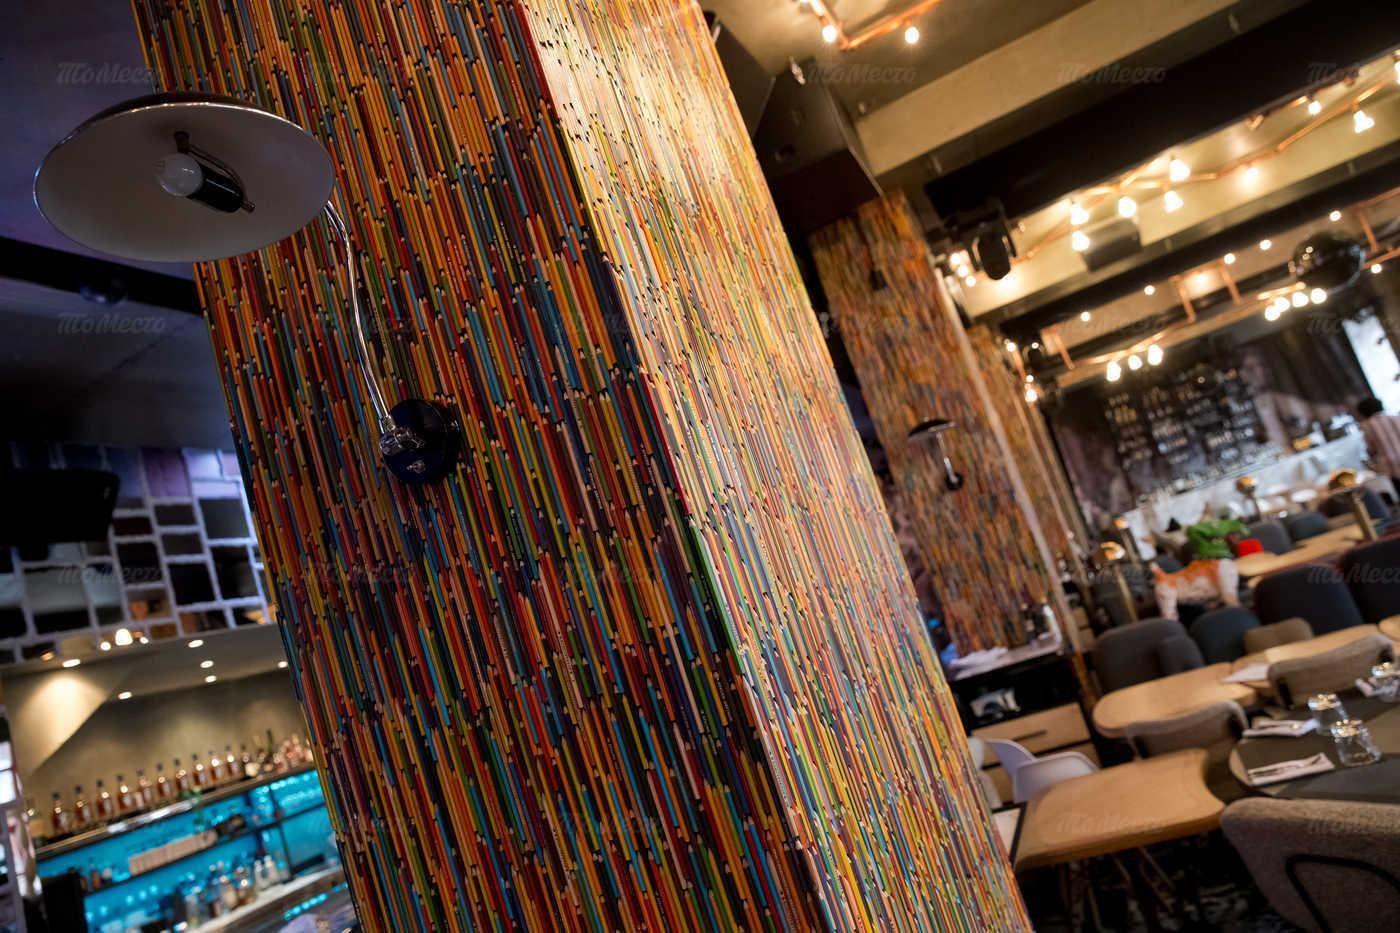 Меню ночного клуба, ресторана For people by people (PPL) на Якиманской набережной